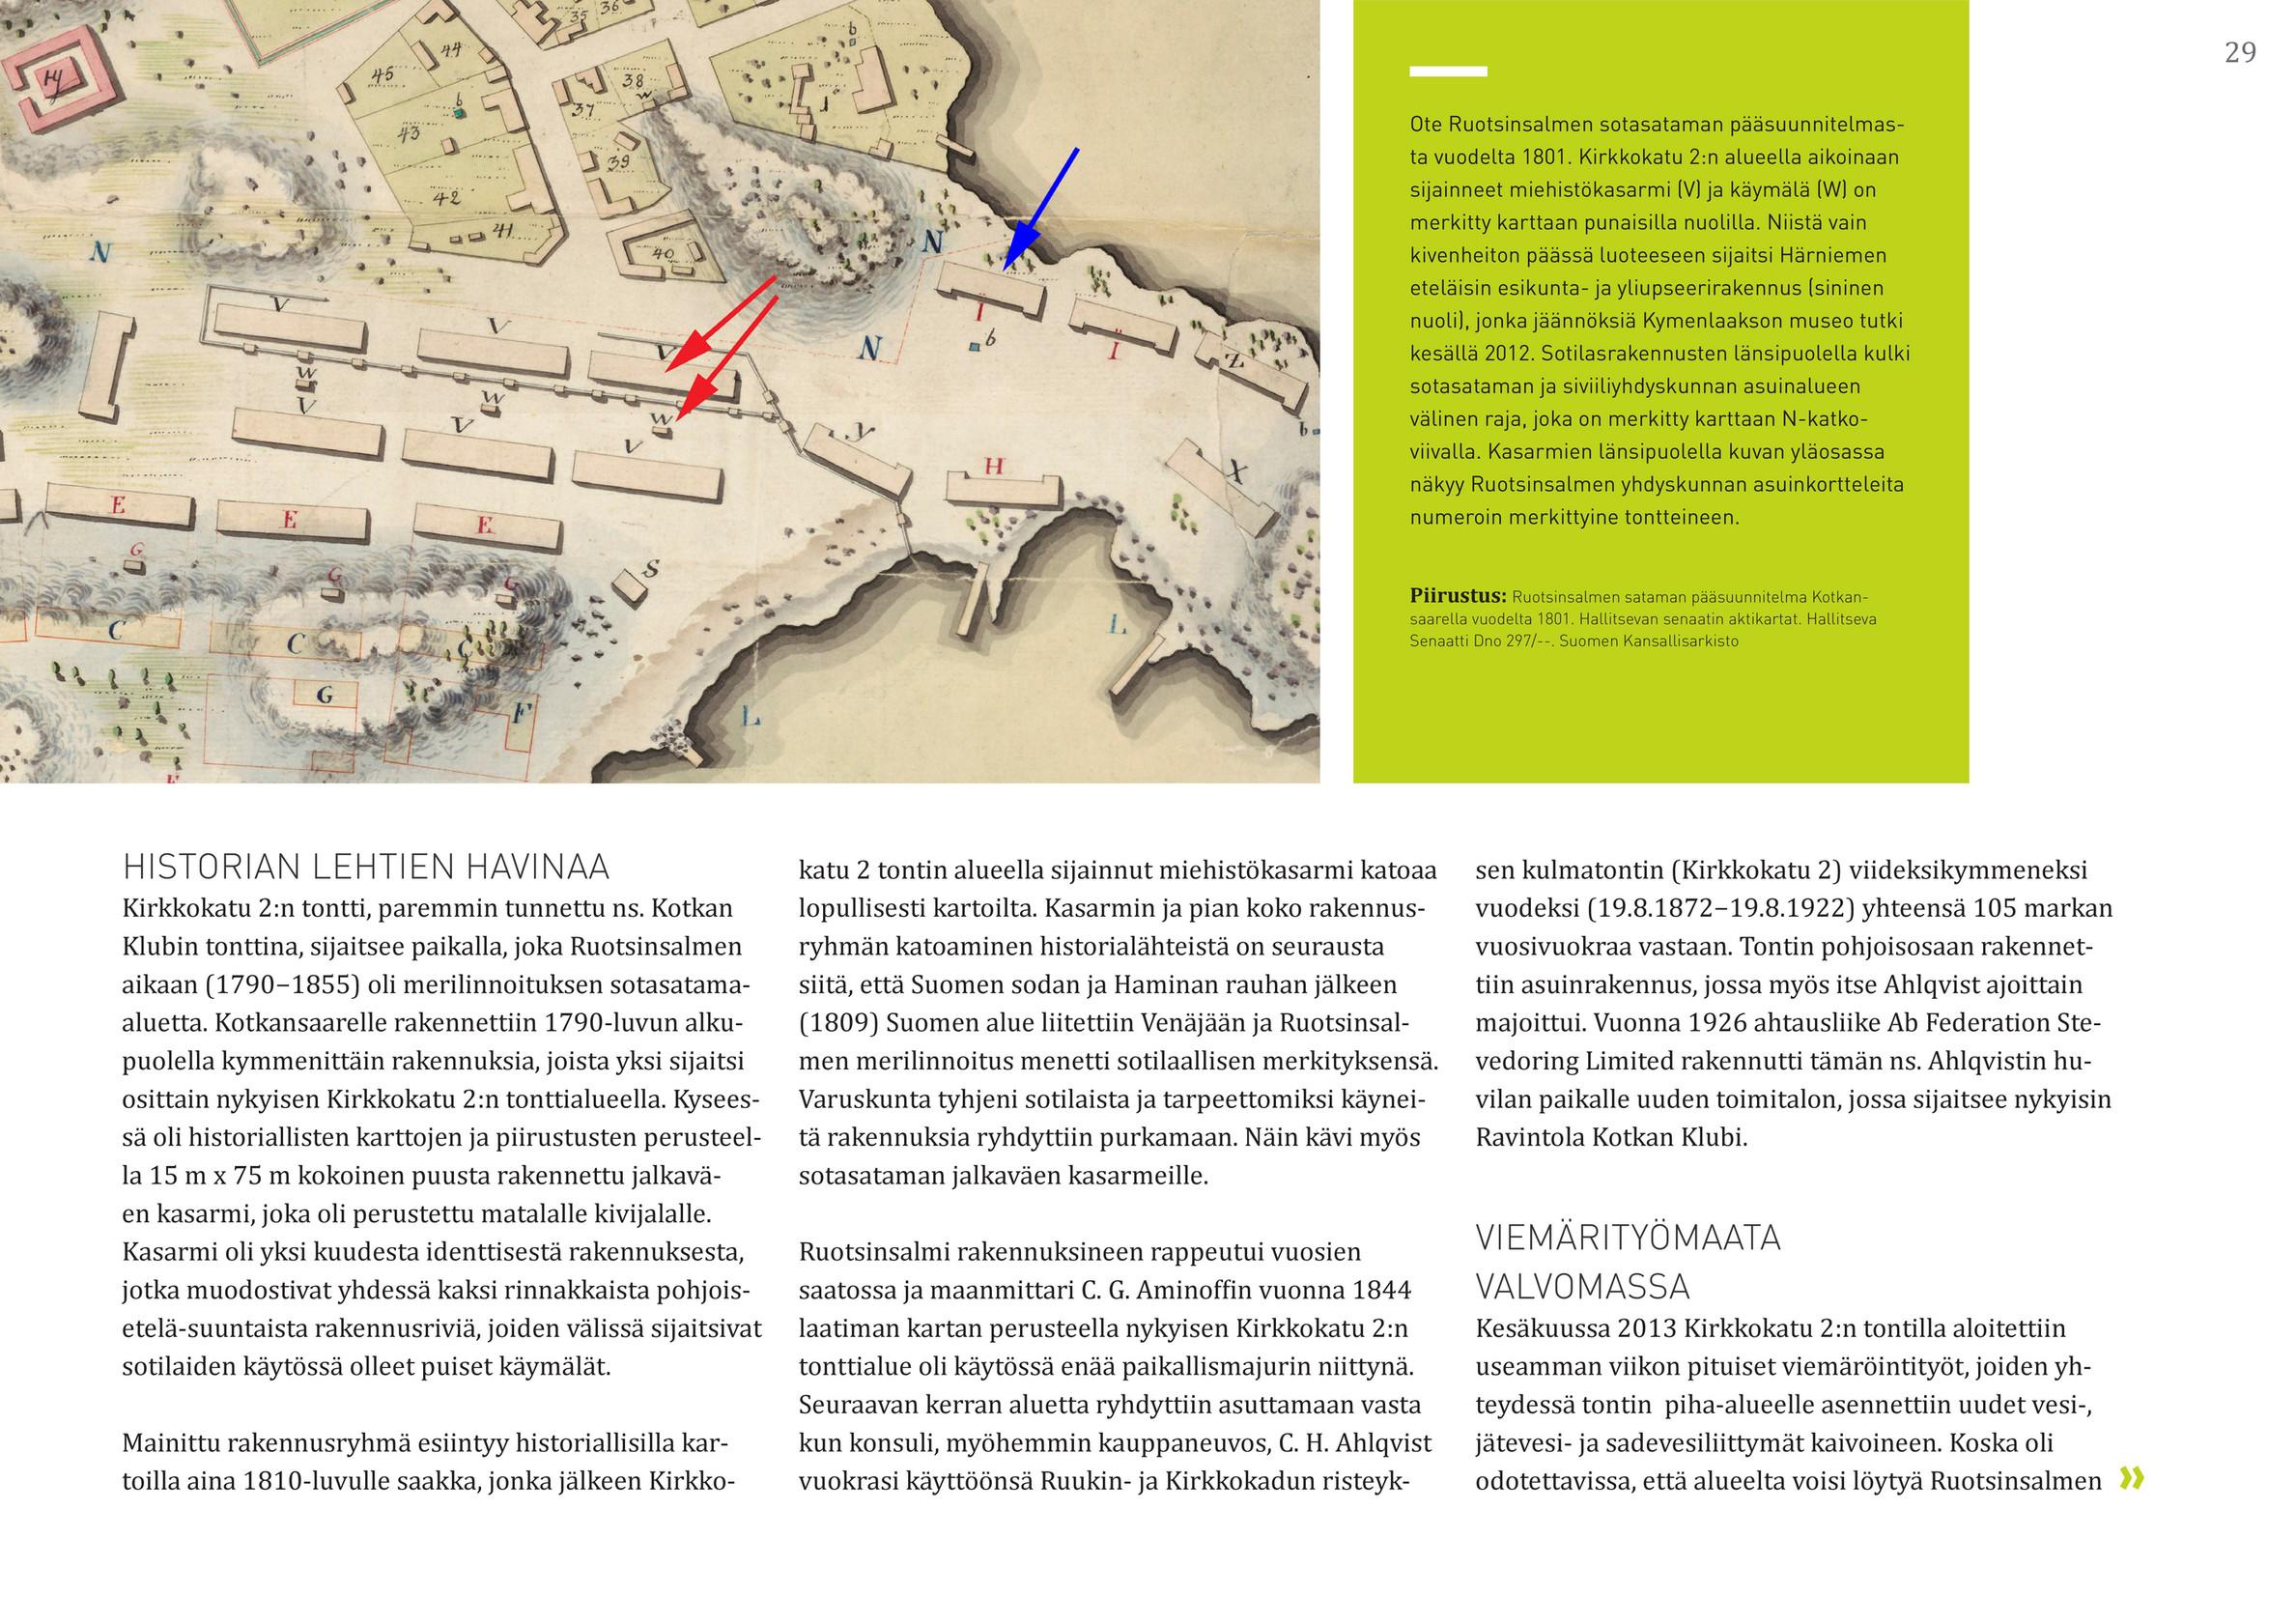 Kymenlaakson Museo Taapeli 2014 Sivu 29 Created With